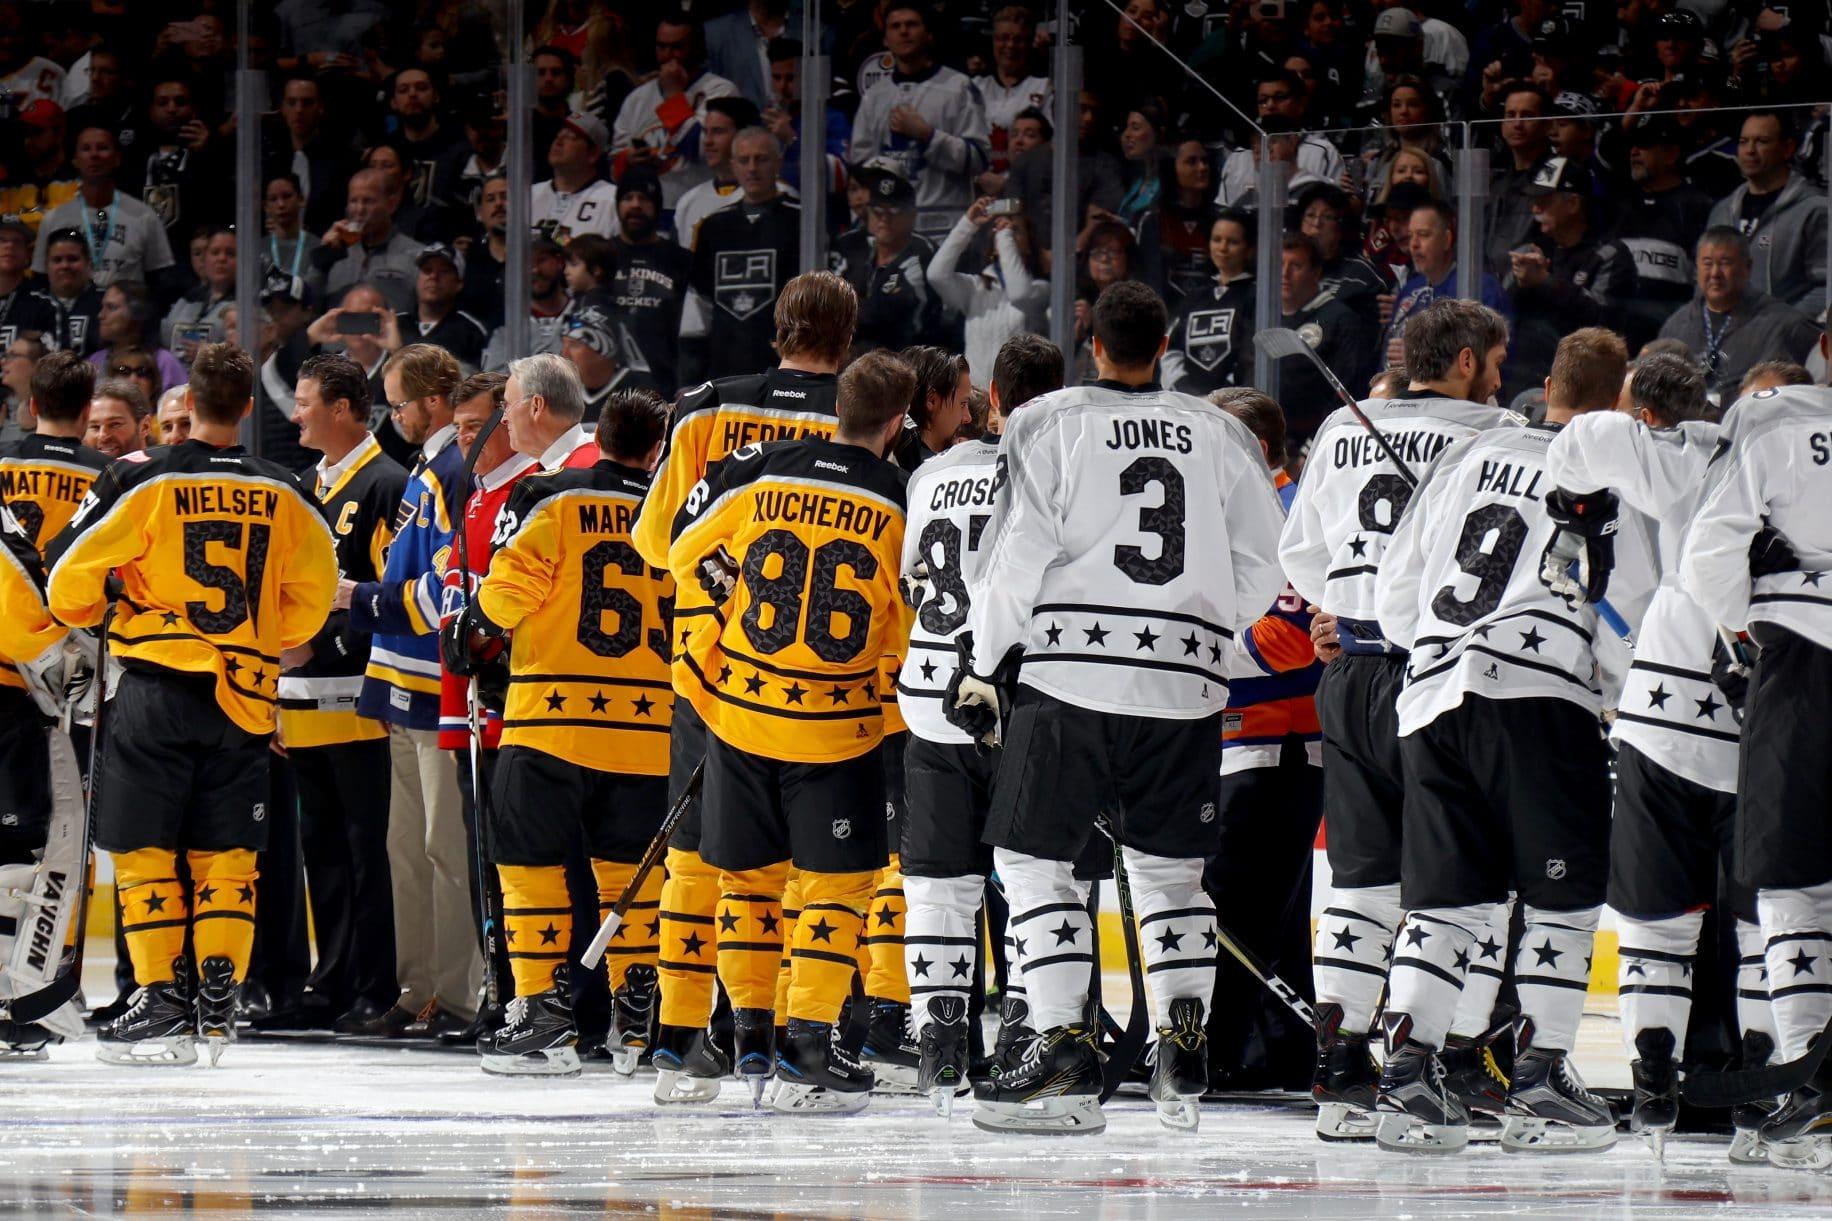 NHL All-Star Game